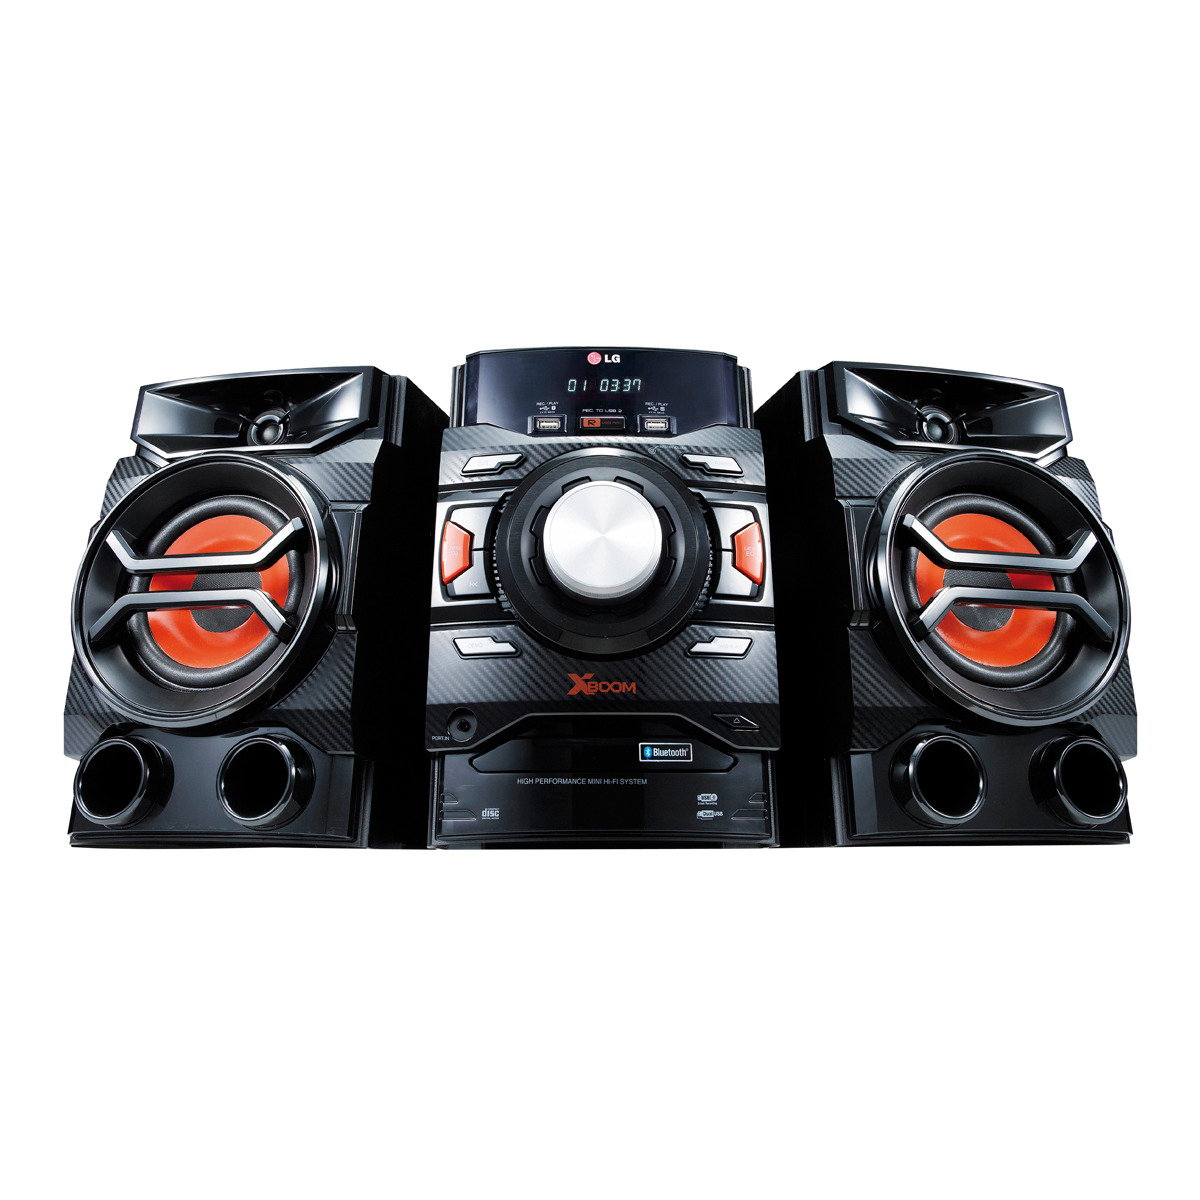 Equipo Hi-Fi LG CM4350 con CD, Radio, USB Recording y Bluetooth